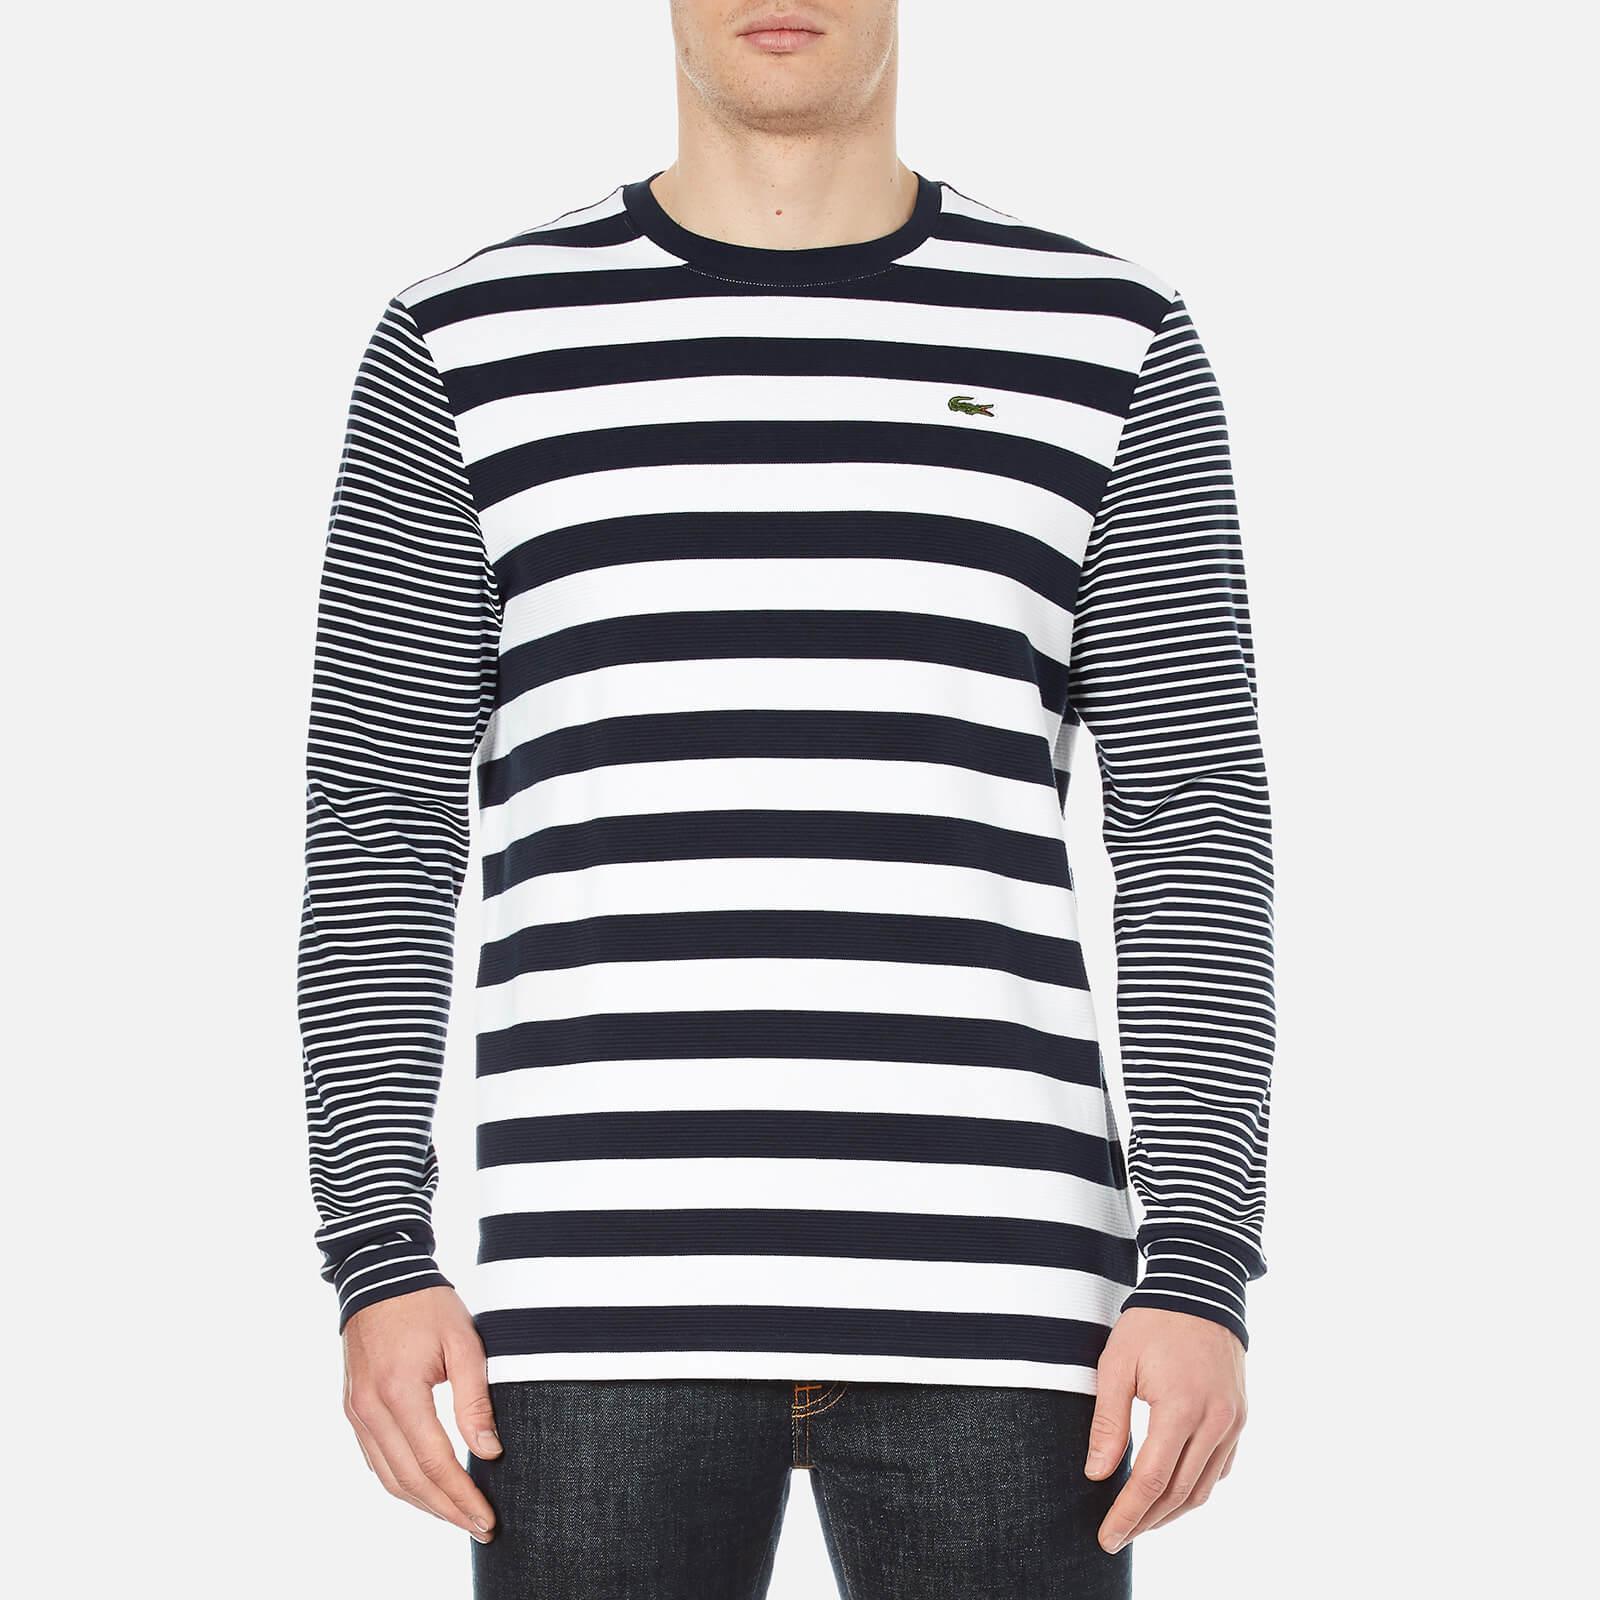 9cad76686ff9c Lacoste L!ve Men s Long Sleeve Stripe T-Shirt - Navy Blue White - Free UK  Delivery over £50